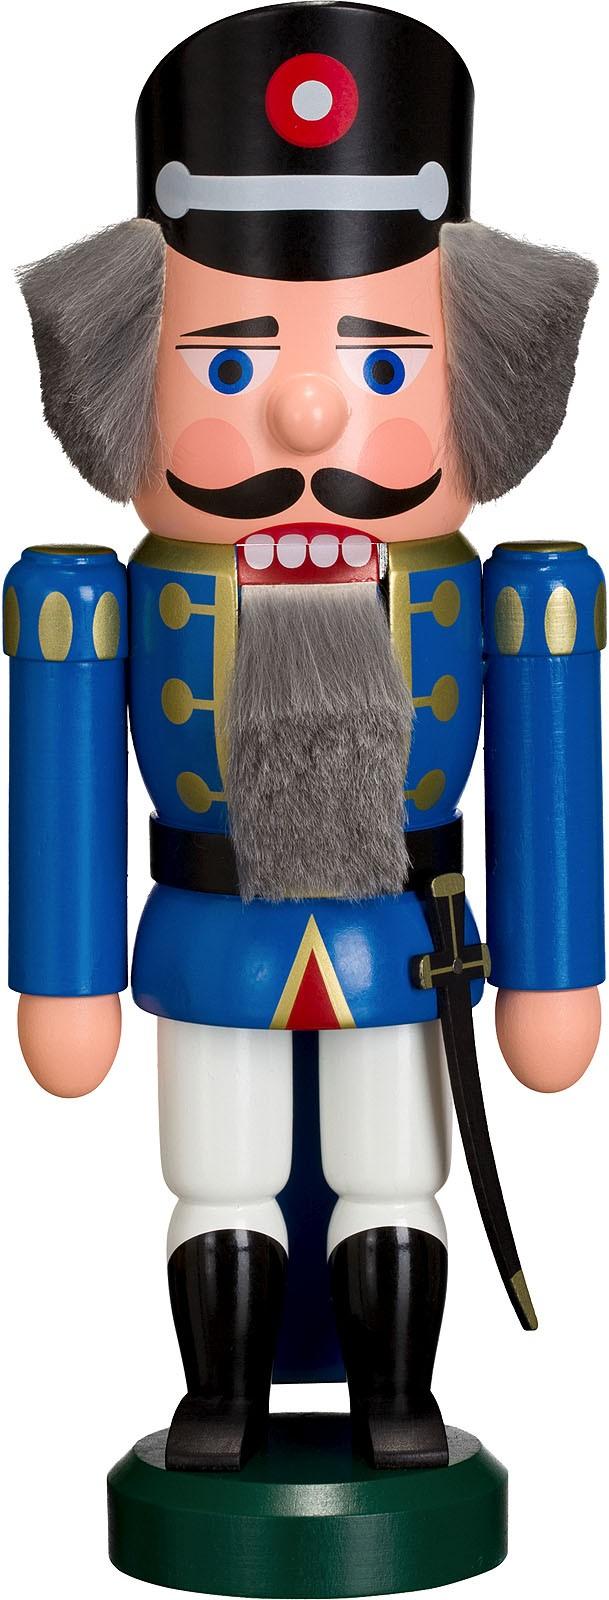 Nussknacker Polizist, blau, 25 cm